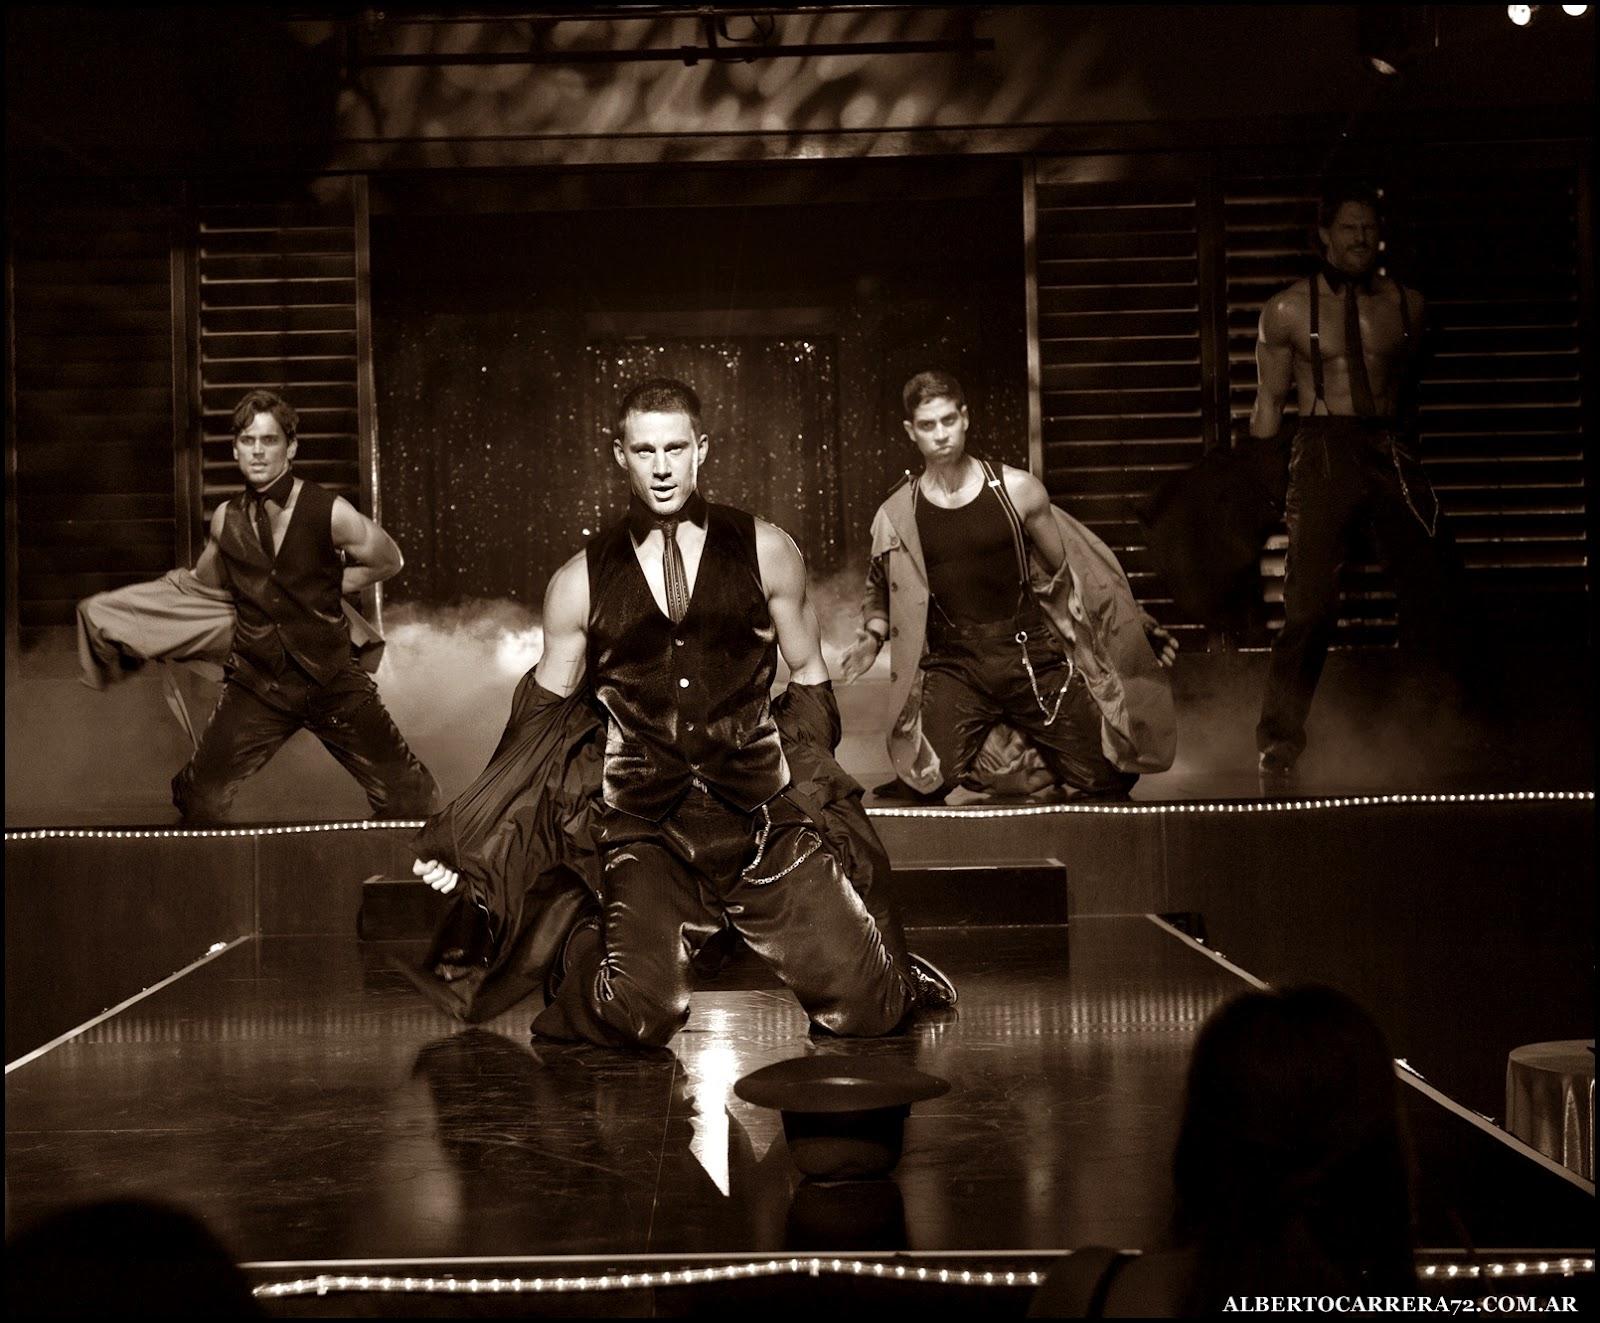 http://2.bp.blogspot.com/-DgTHRPluURU/T70zW3KSUzI/AAAAAAAAUHA/RlrtnEpZCkE/s1600/Magic_Mike_Channing_Tatum_strippers_masculinos-.jpg